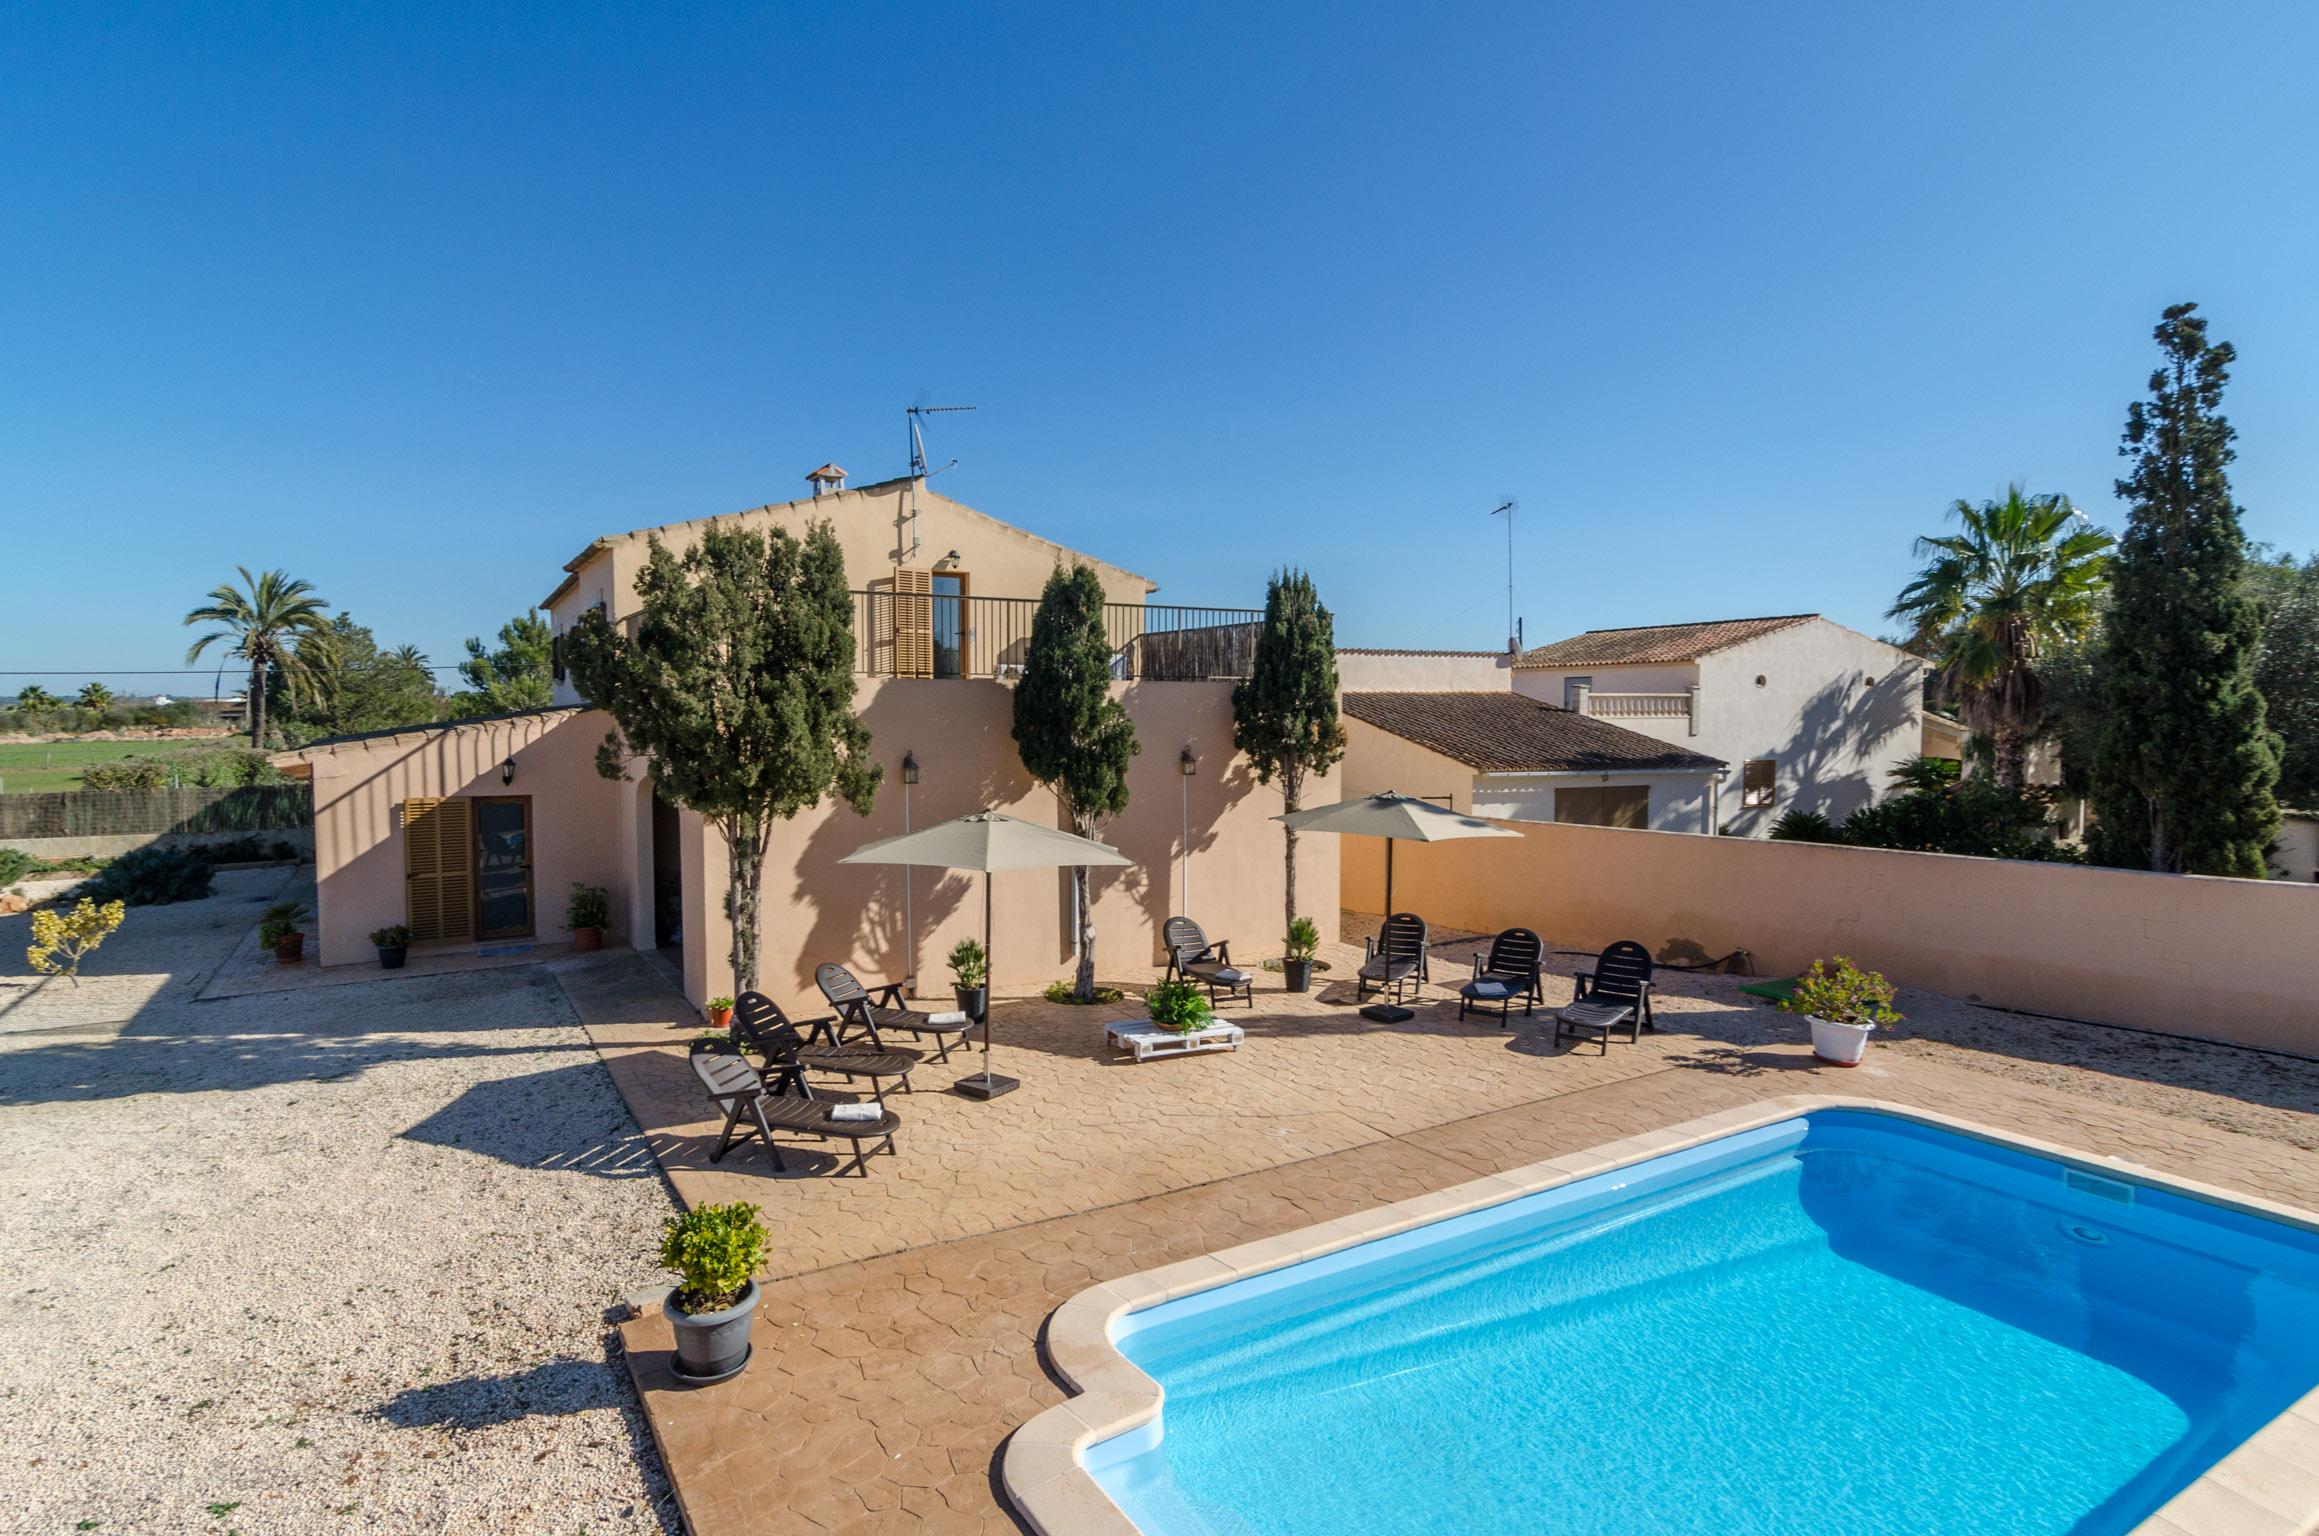 Ferienhaus SANT BLAI VELL (2284789), Campos, Mallorca, Balearische Inseln, Spanien, Bild 4